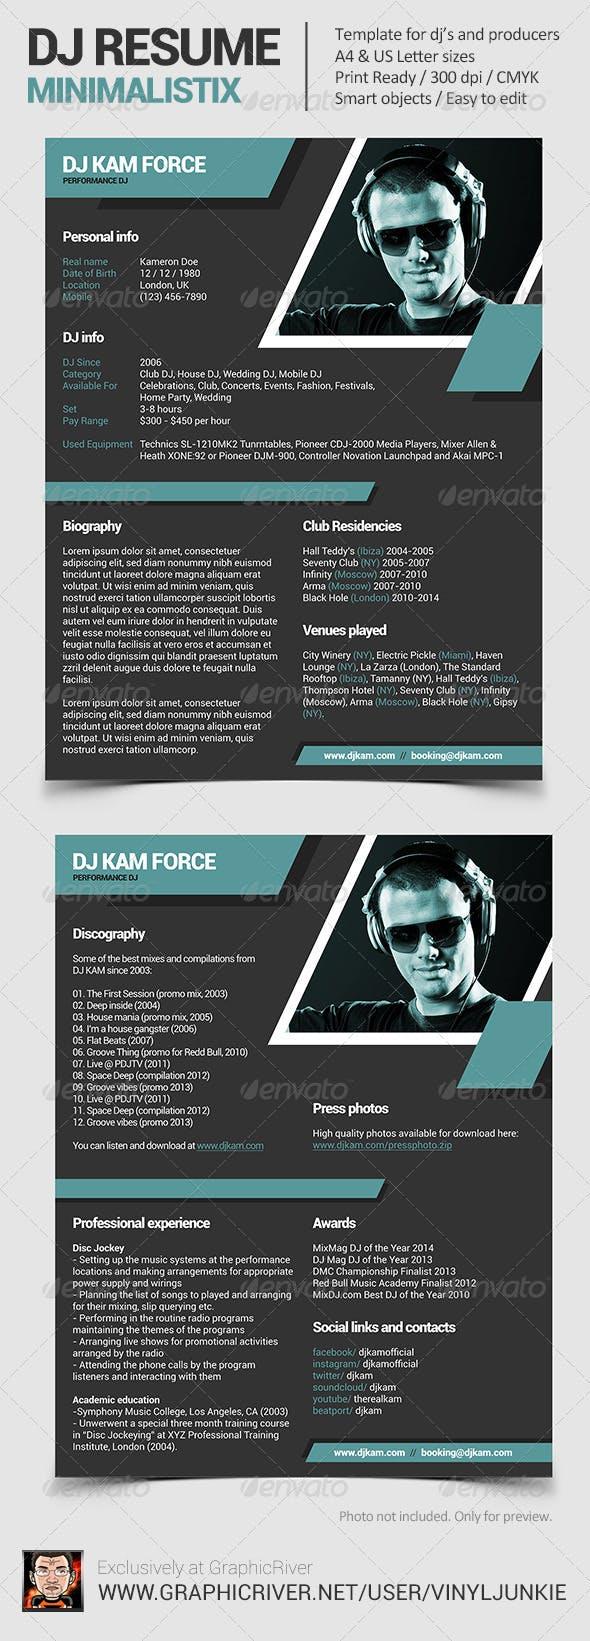 Minimalistix Dj Resume Press Kit By Vinyljunkie Graphicriver Resumes Stationery